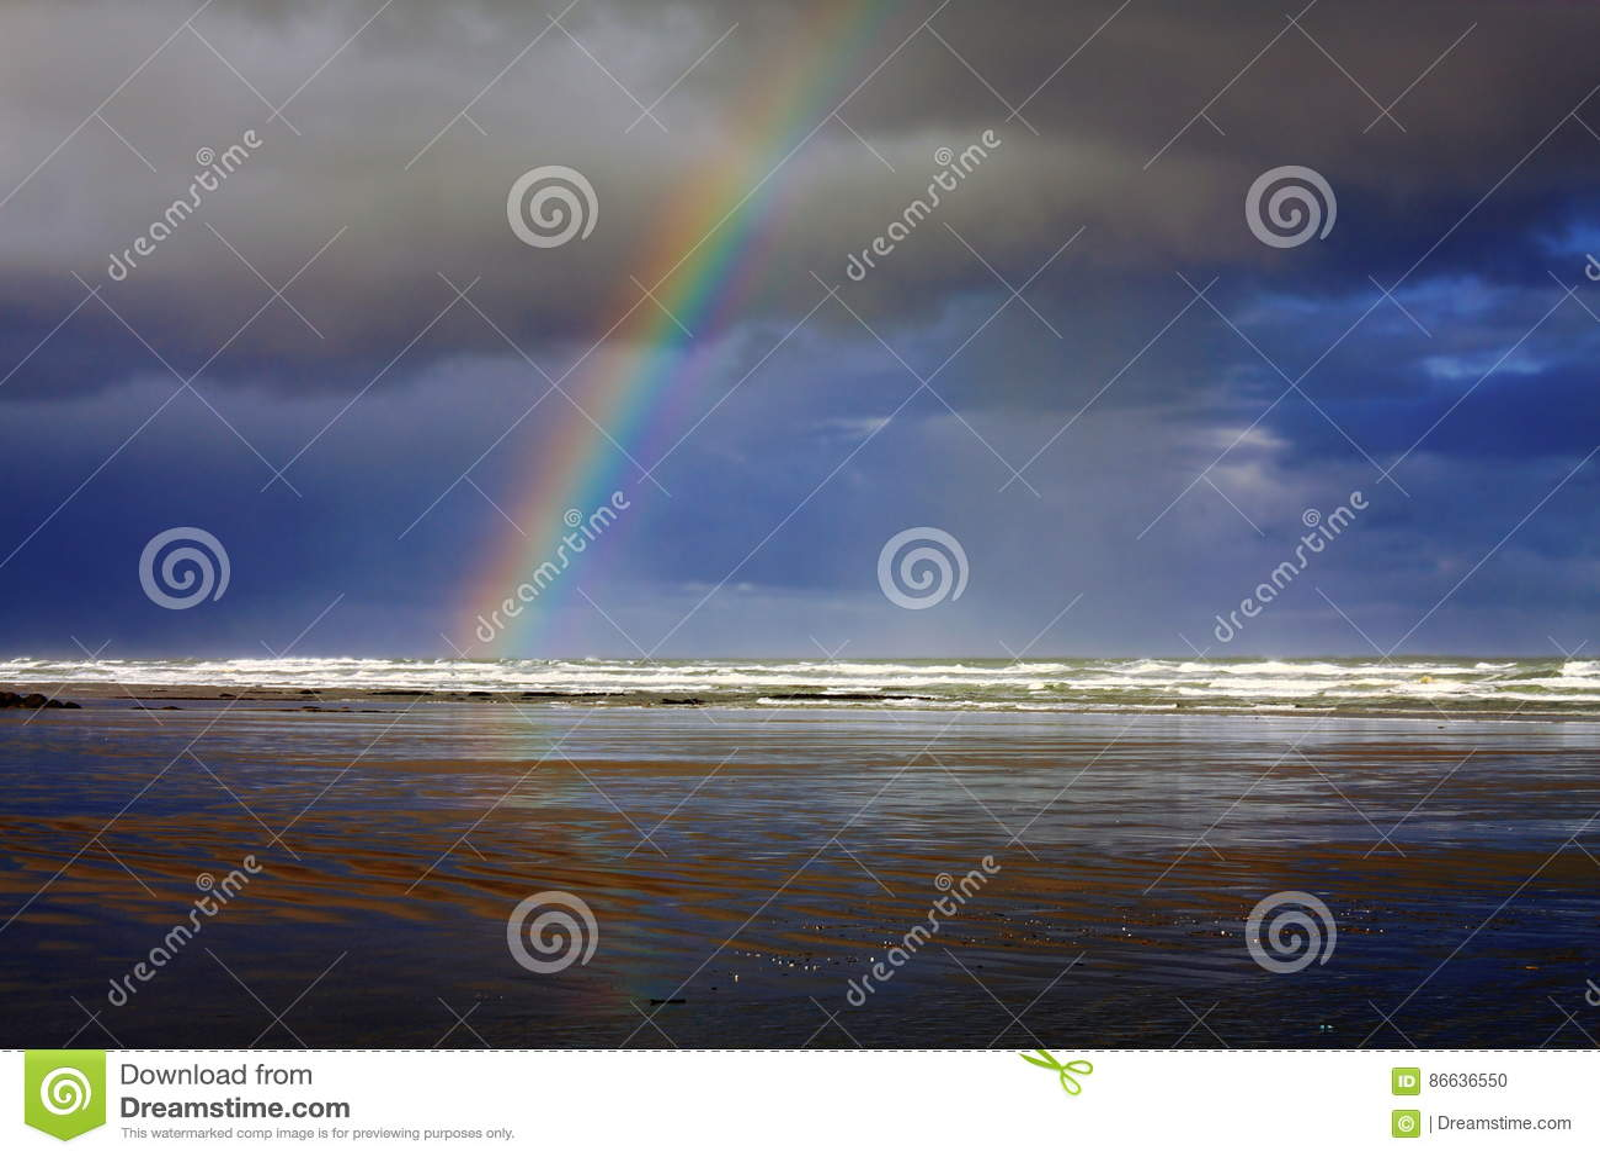 Rainbow At Nye Beach In Newport Oregon Stock Photo Image 86636550